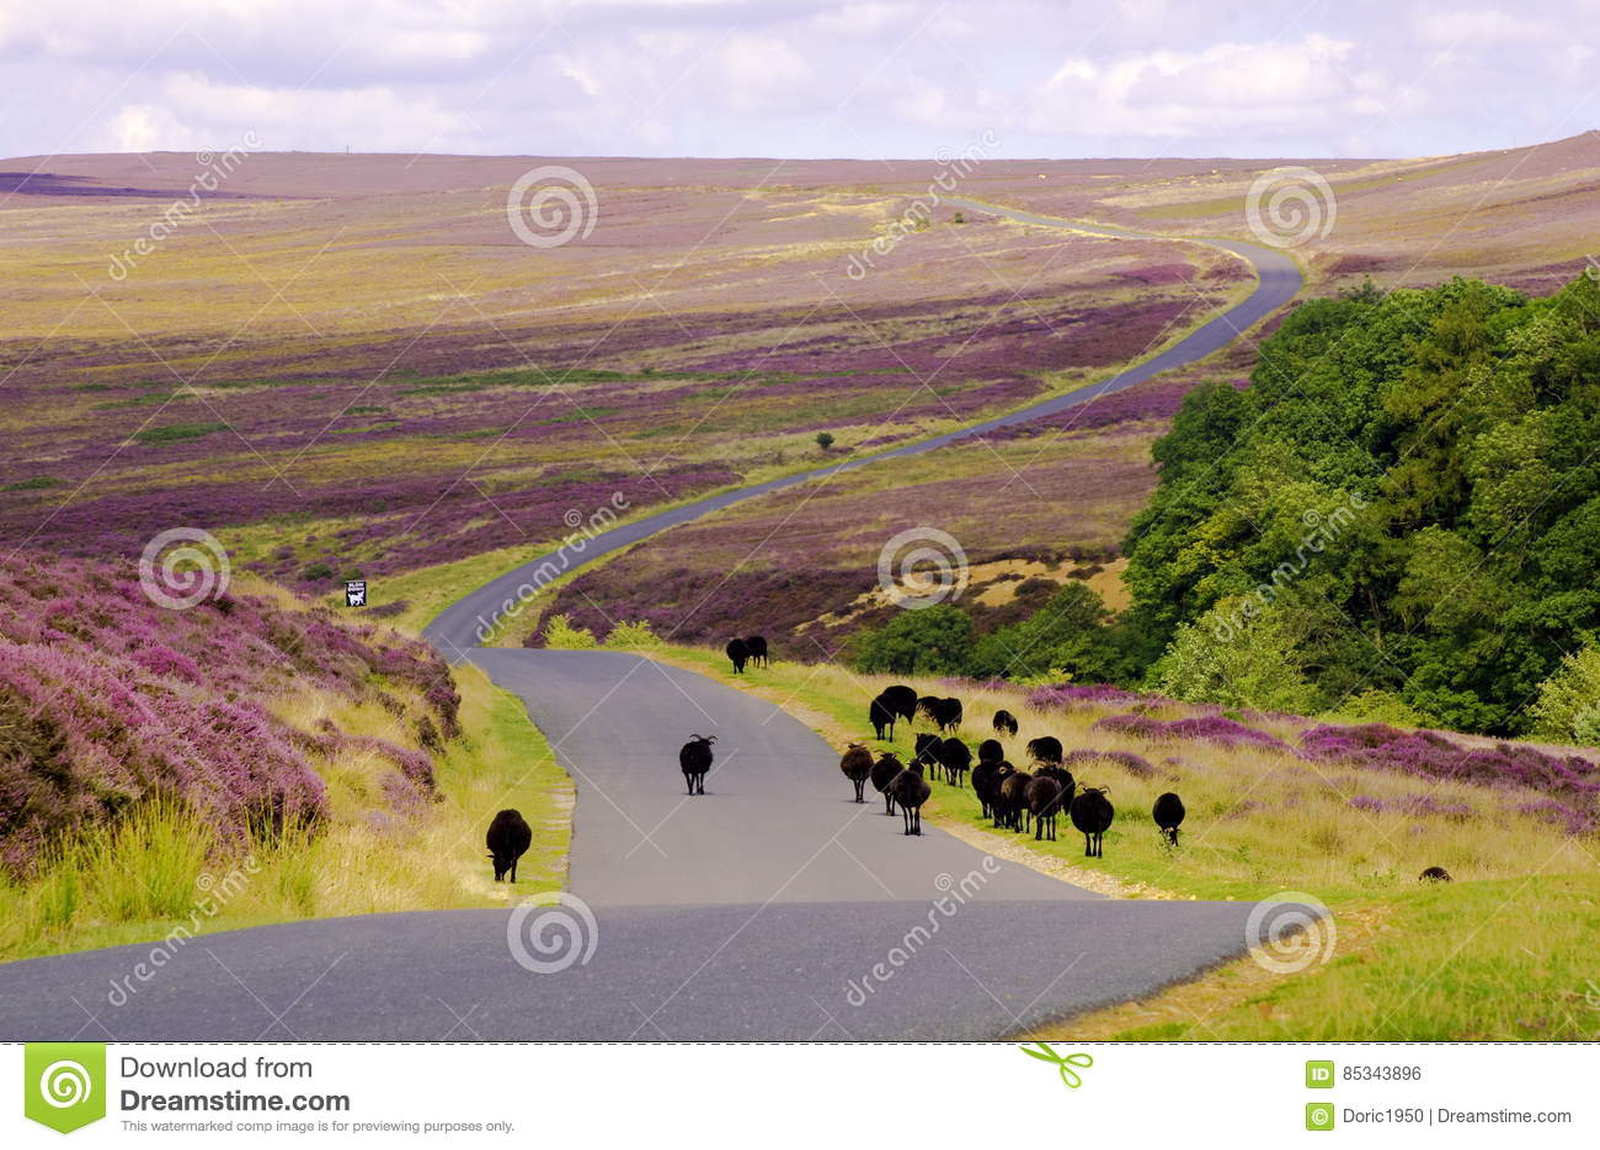 Black Sheep on Spaunton Moor, North York Moors